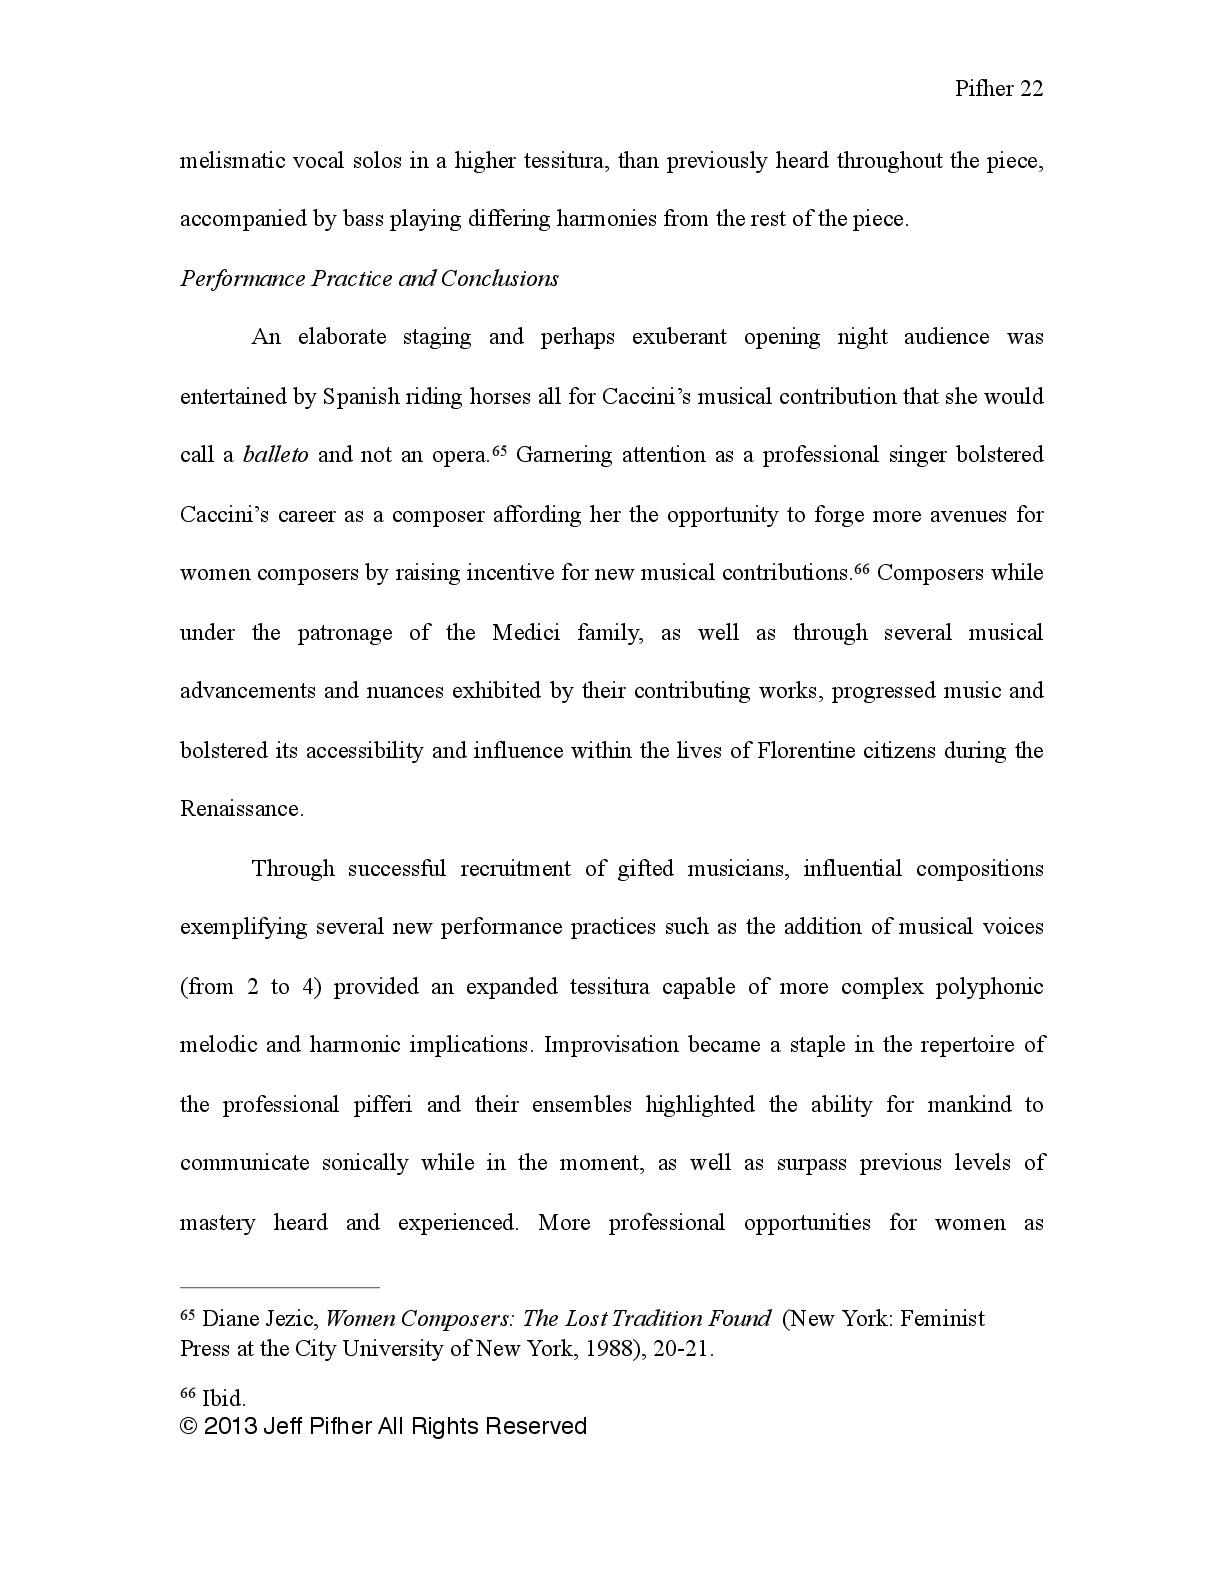 Jeff-Pifher-Music-and-Mediciean-Influences-(Academic-Series)-022.jpg